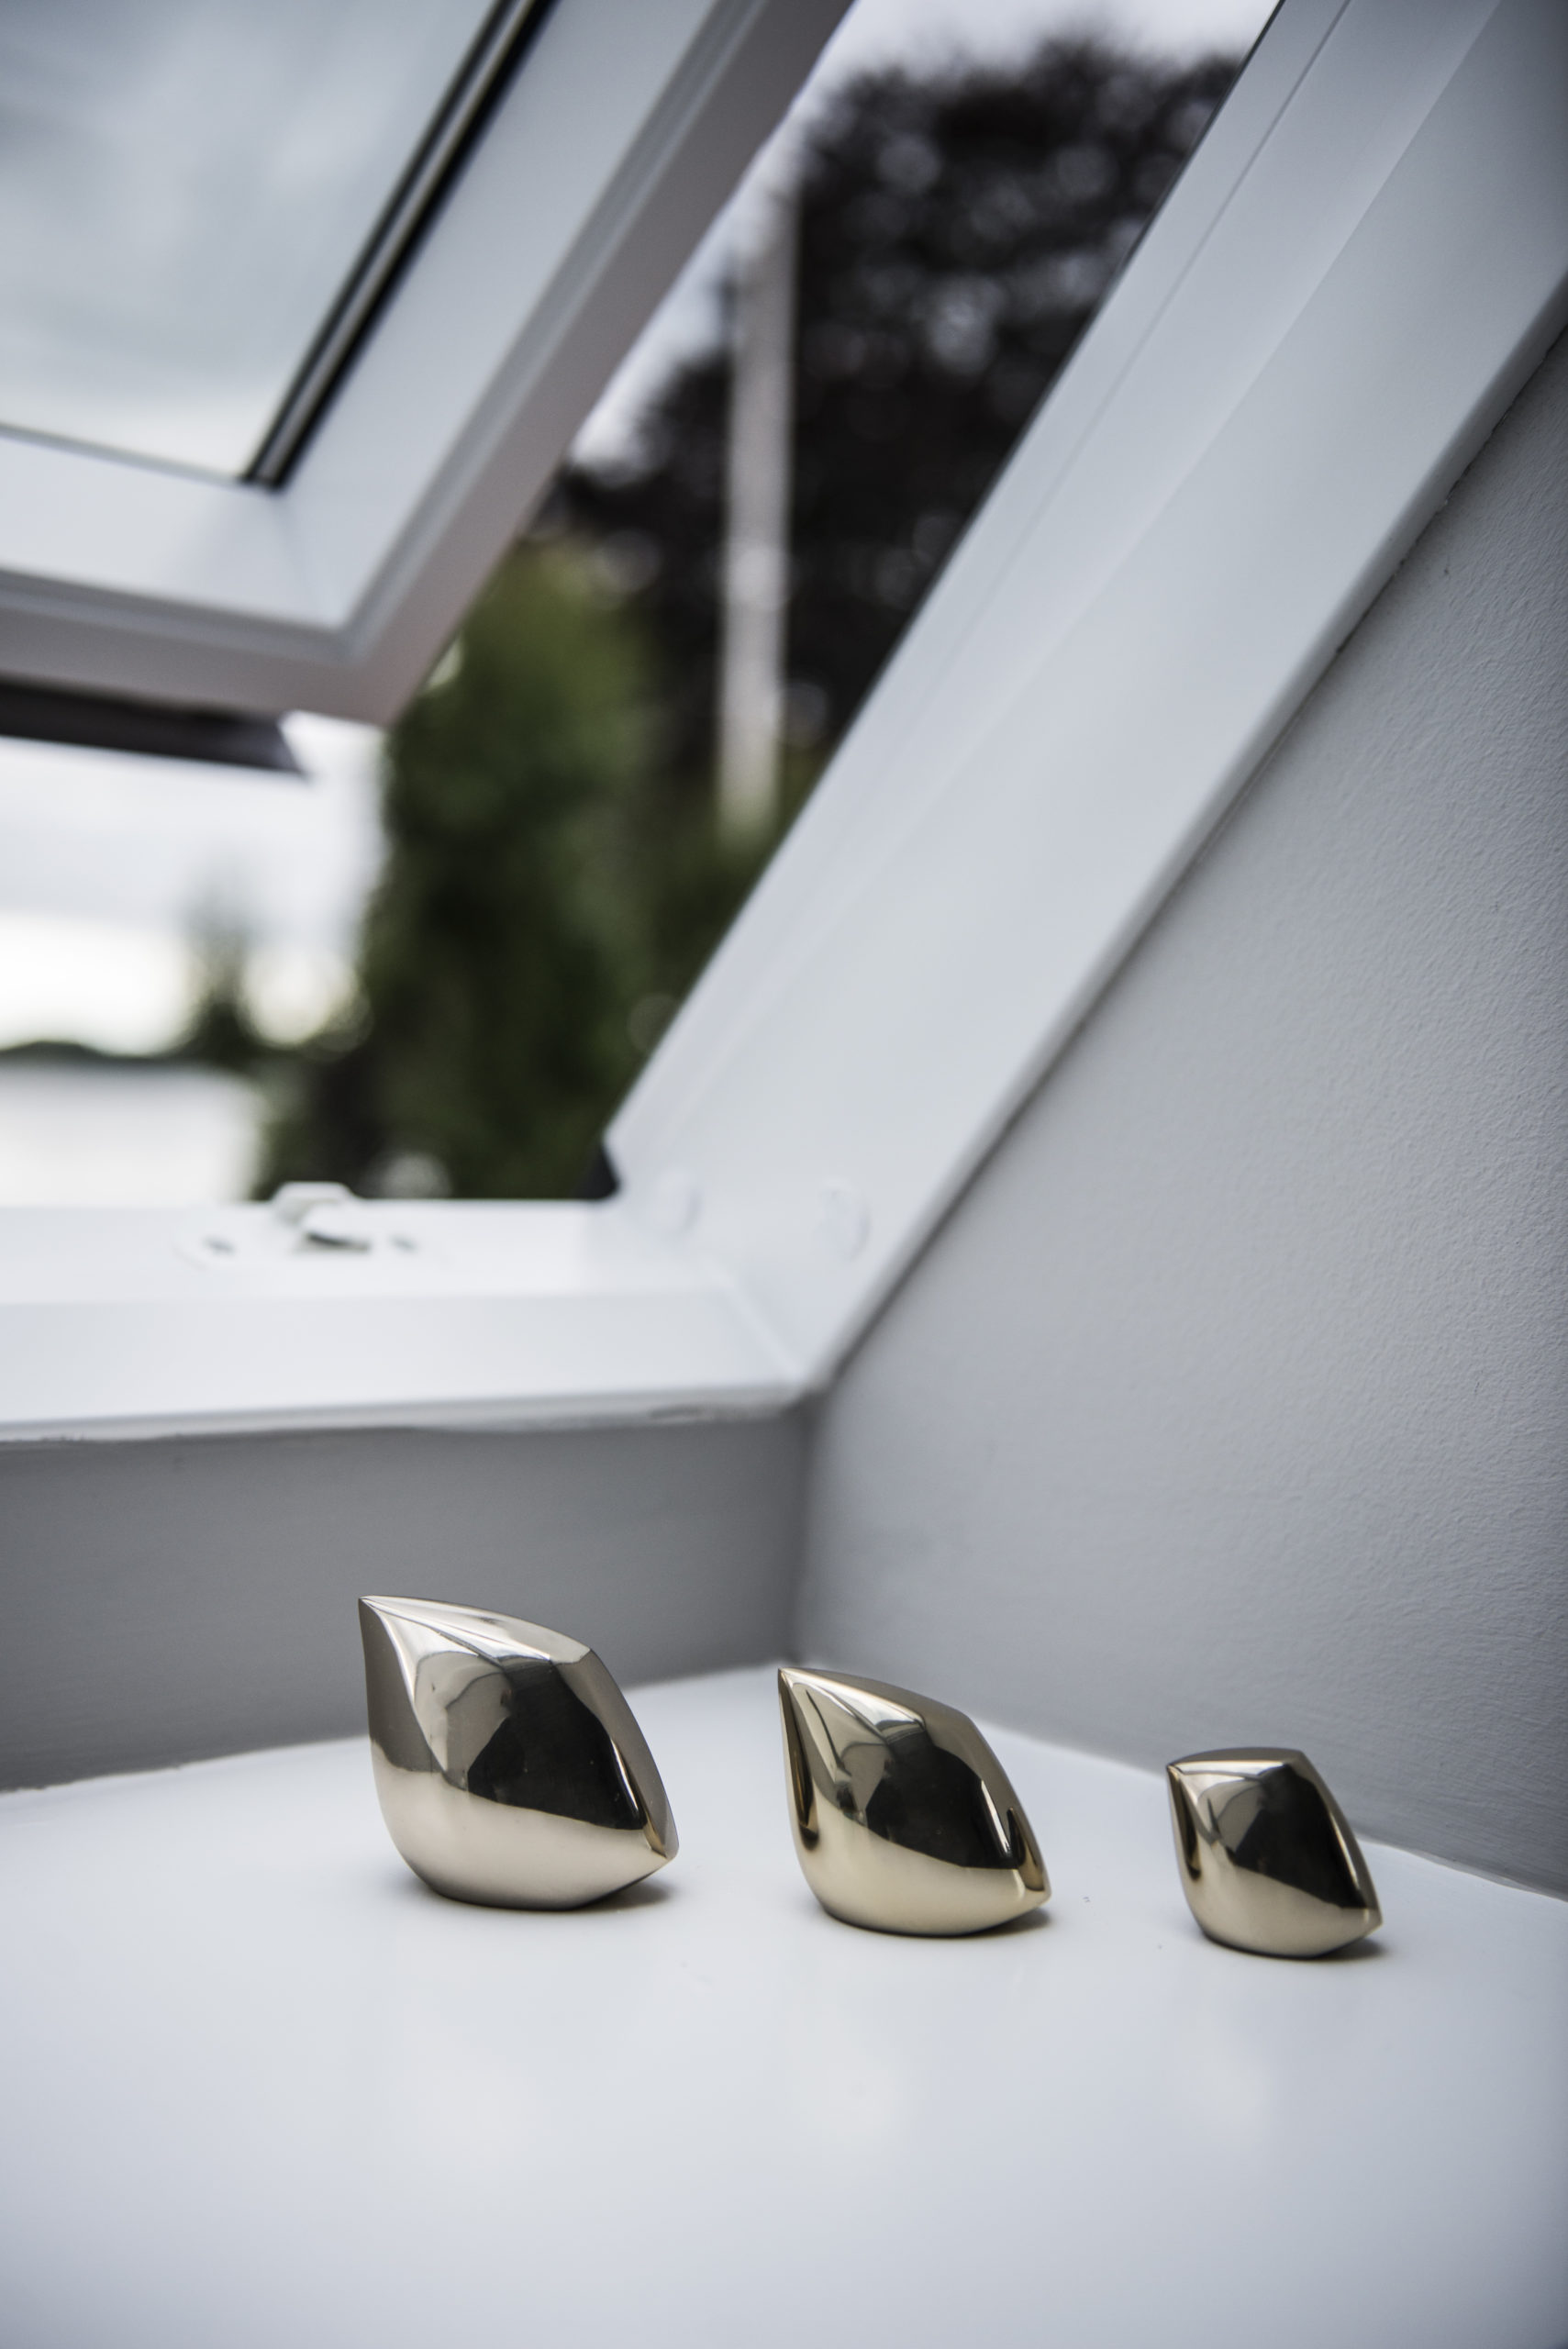 Architectmade-Aves-Bird-Brass-Denmark-Co-Derr